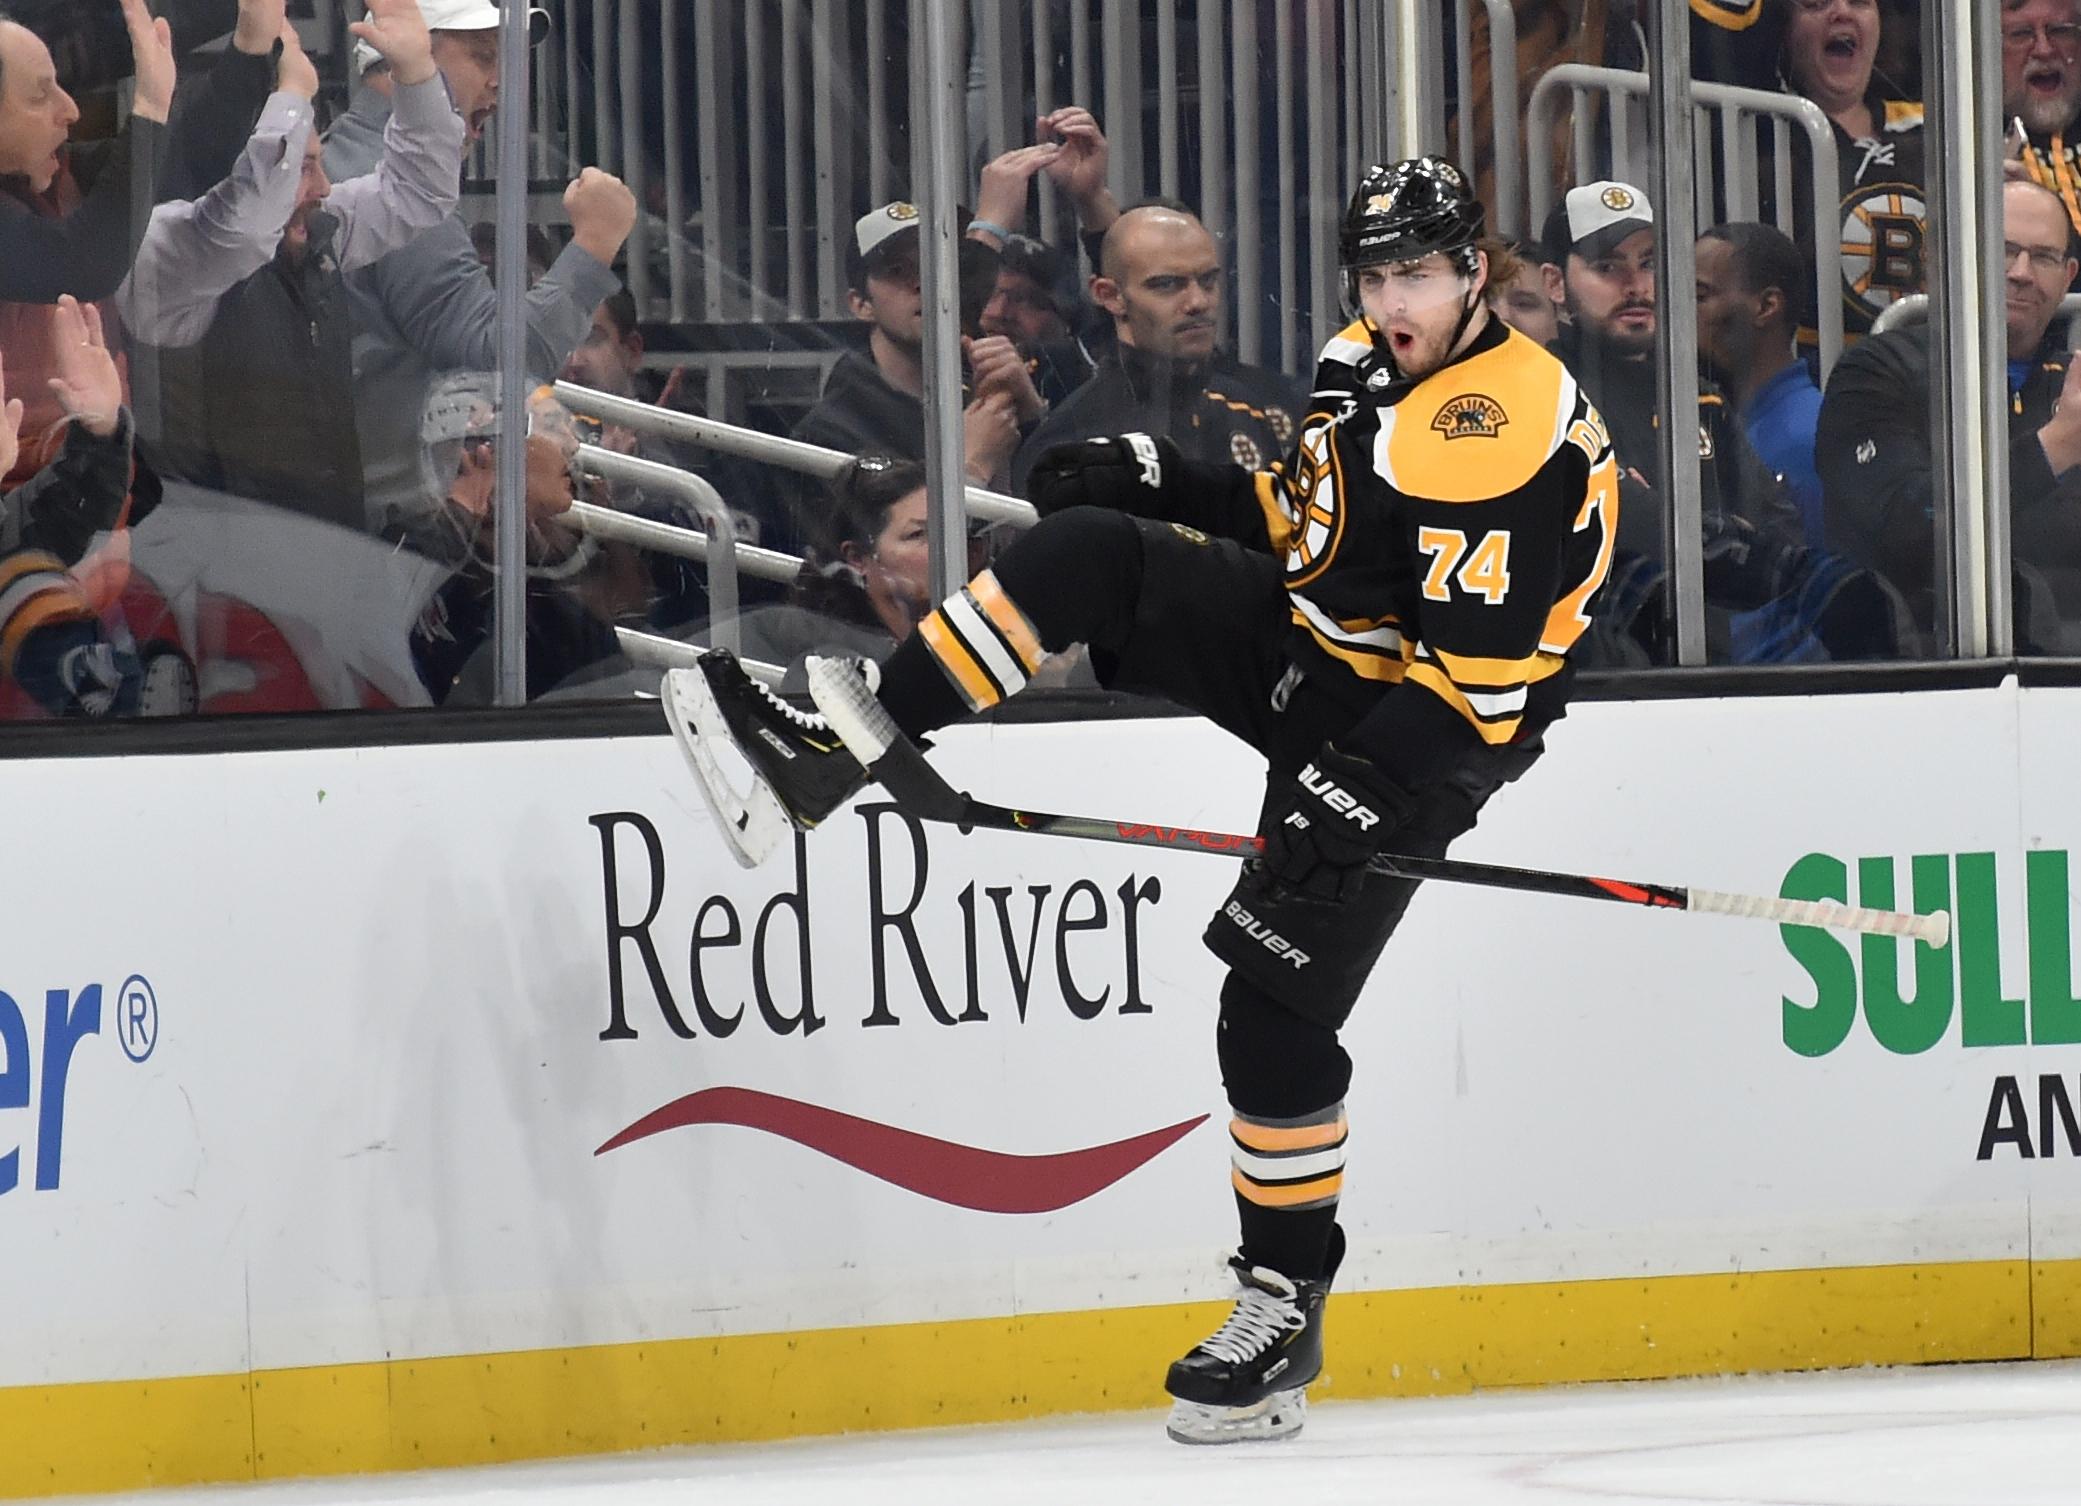 NHL: Boston Bruins vs Winnipeg Jets